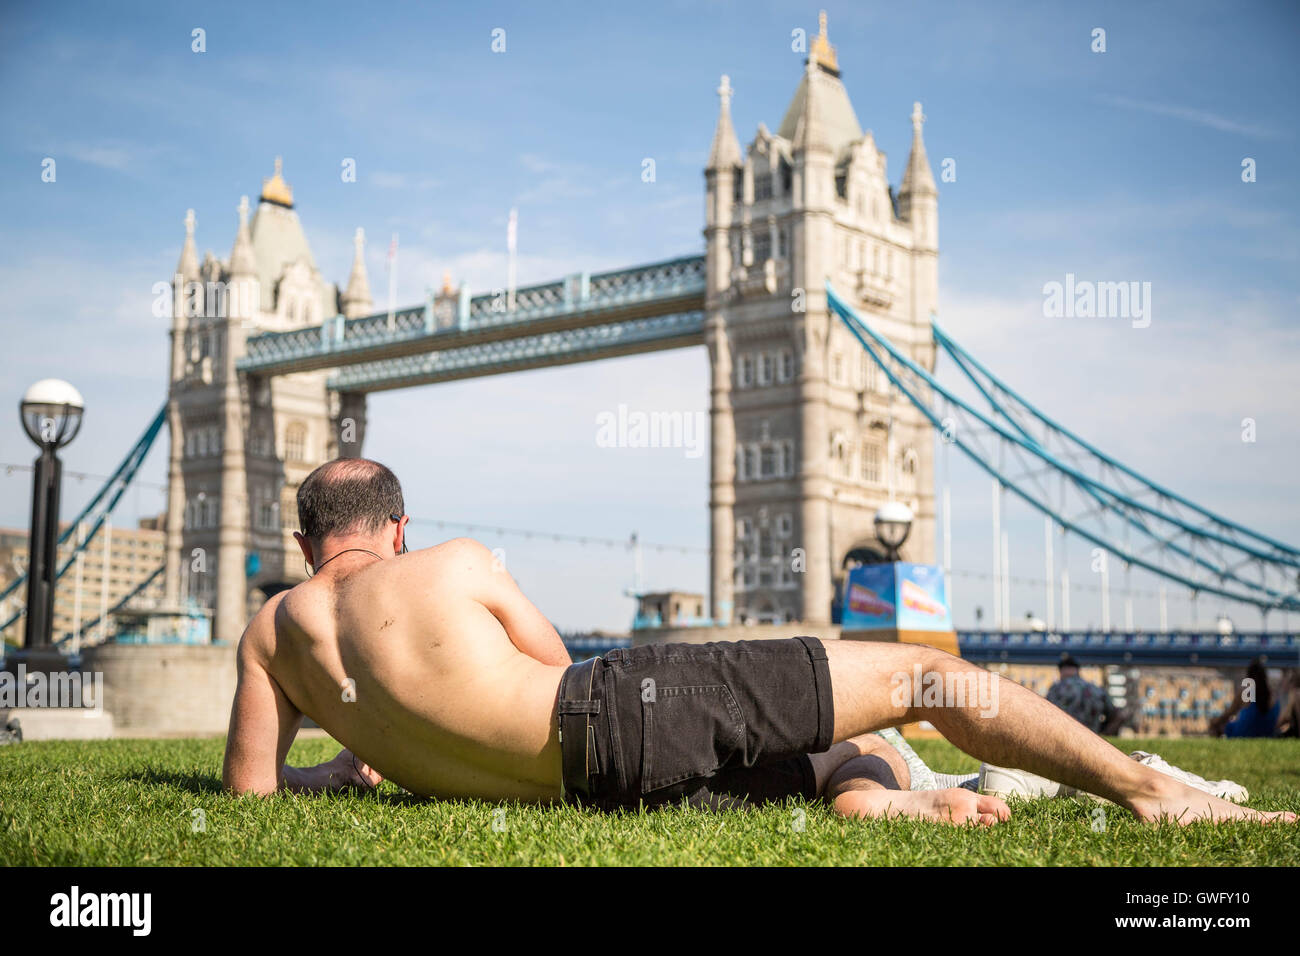 London, UK. 13th September, 2016. UK Weather: Londoners enjoy the city heatwave during Britain's hottest September Stock Photo